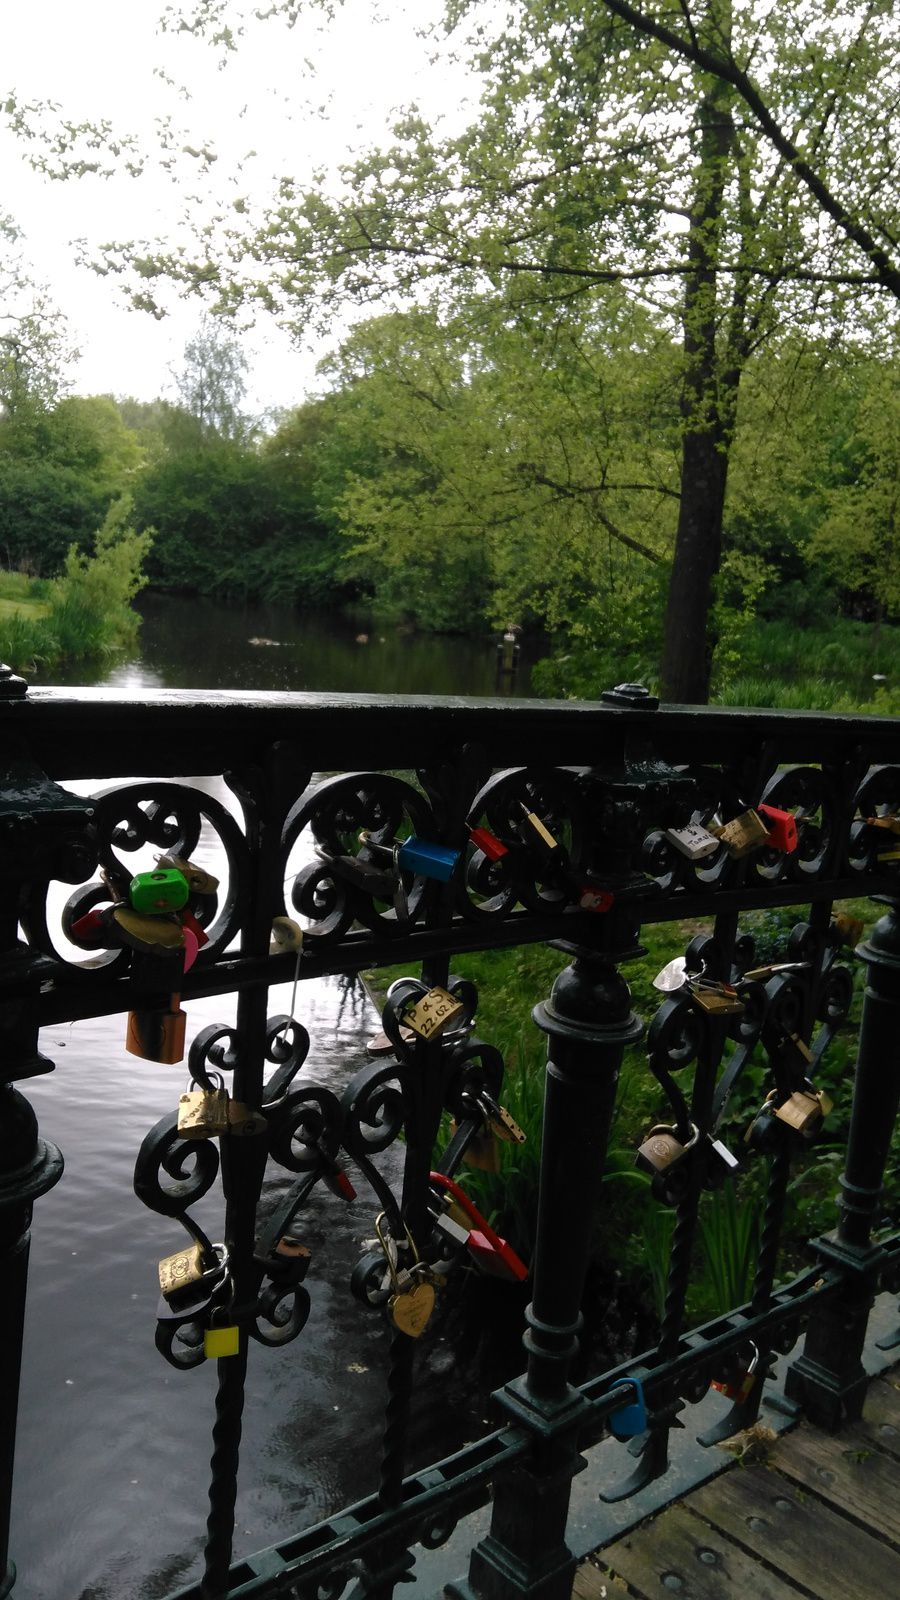 Wherever I go, I Amsterdam